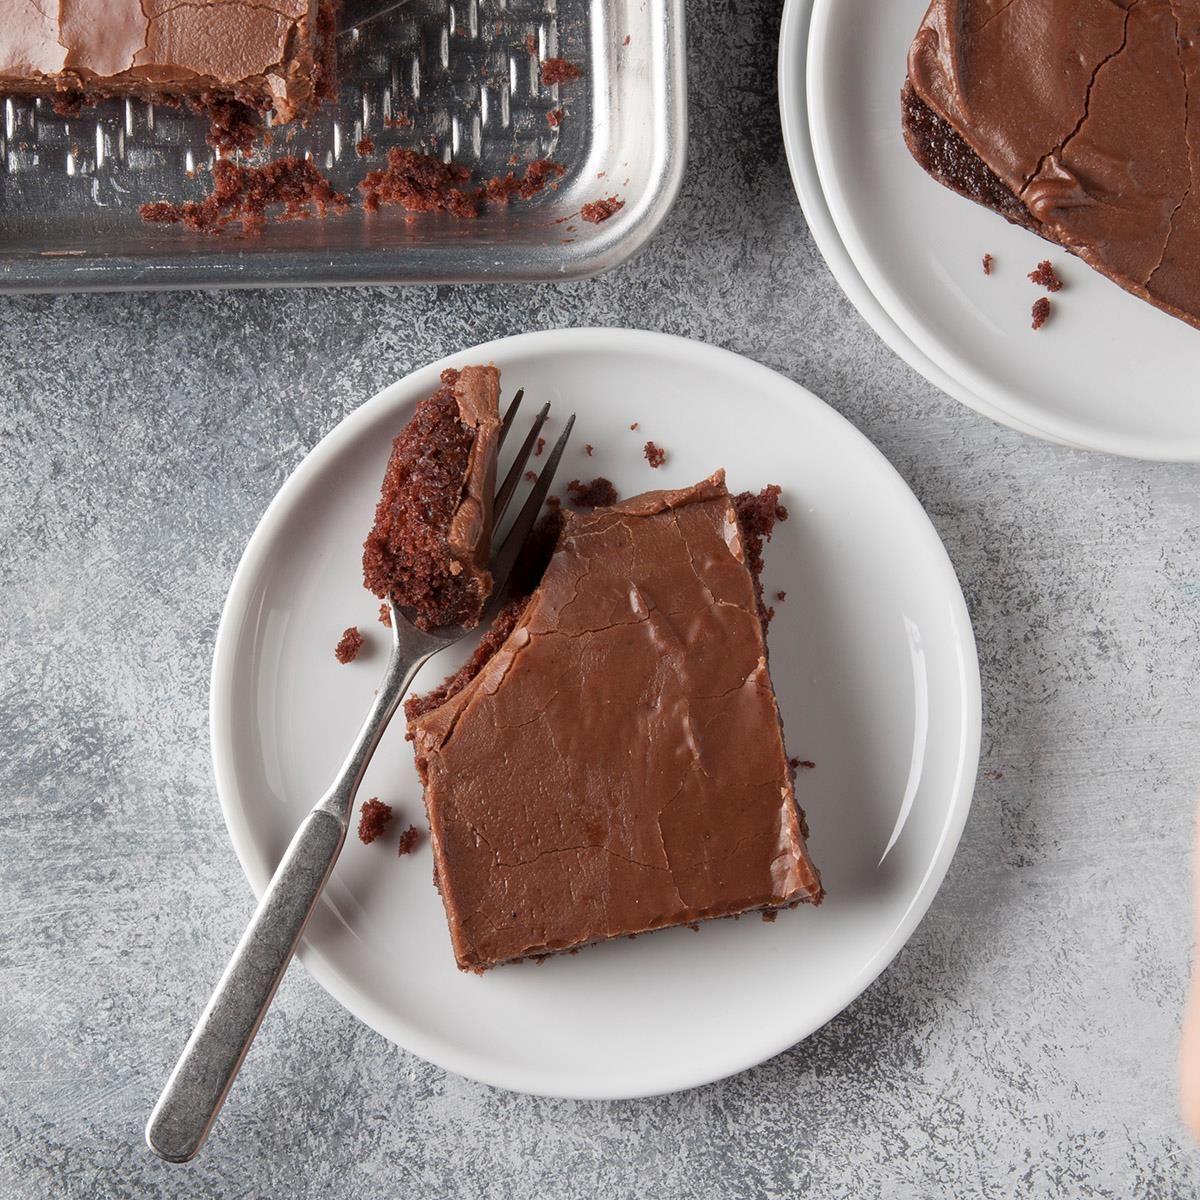 Texas Sheet Cake Recipe Cake Tasting Sheet Cake Recipes